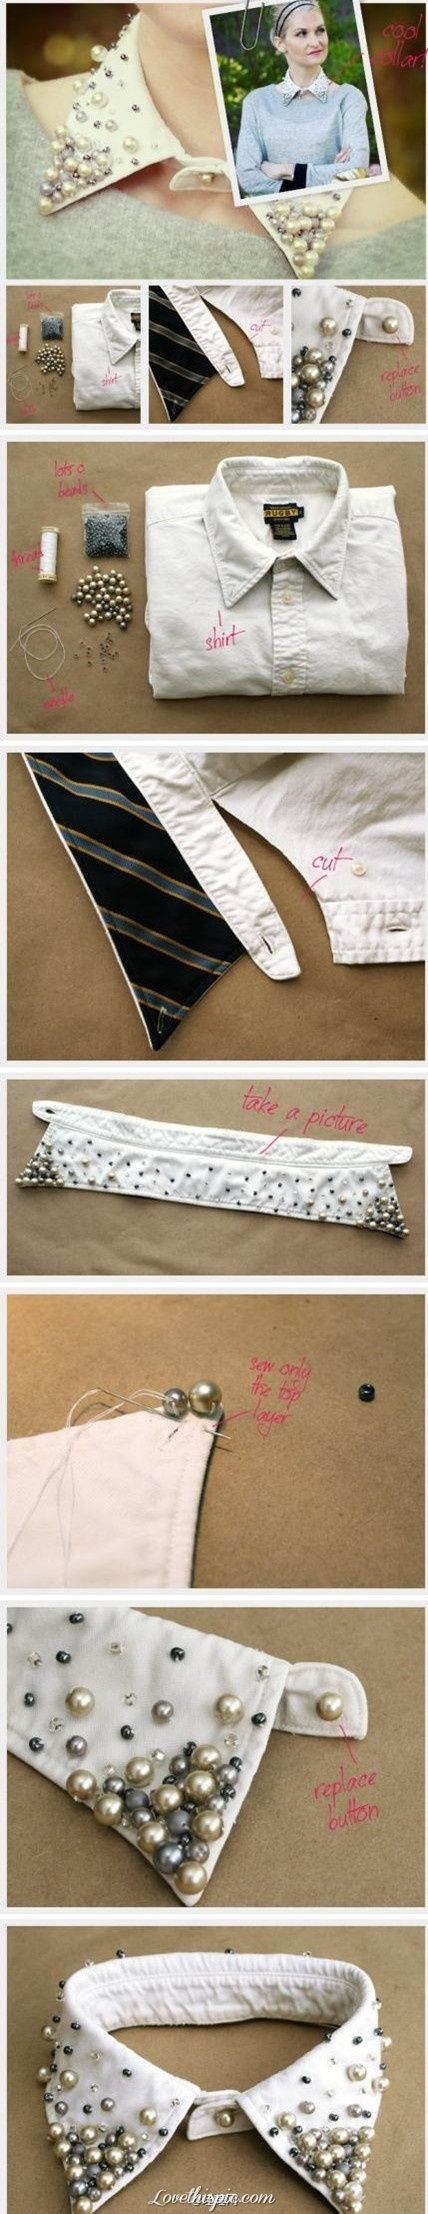 DIY fashionable shirt collar diy crafts craft ideas diy ideas diy clothes fun diy diy shirt diy fashion craft shirt